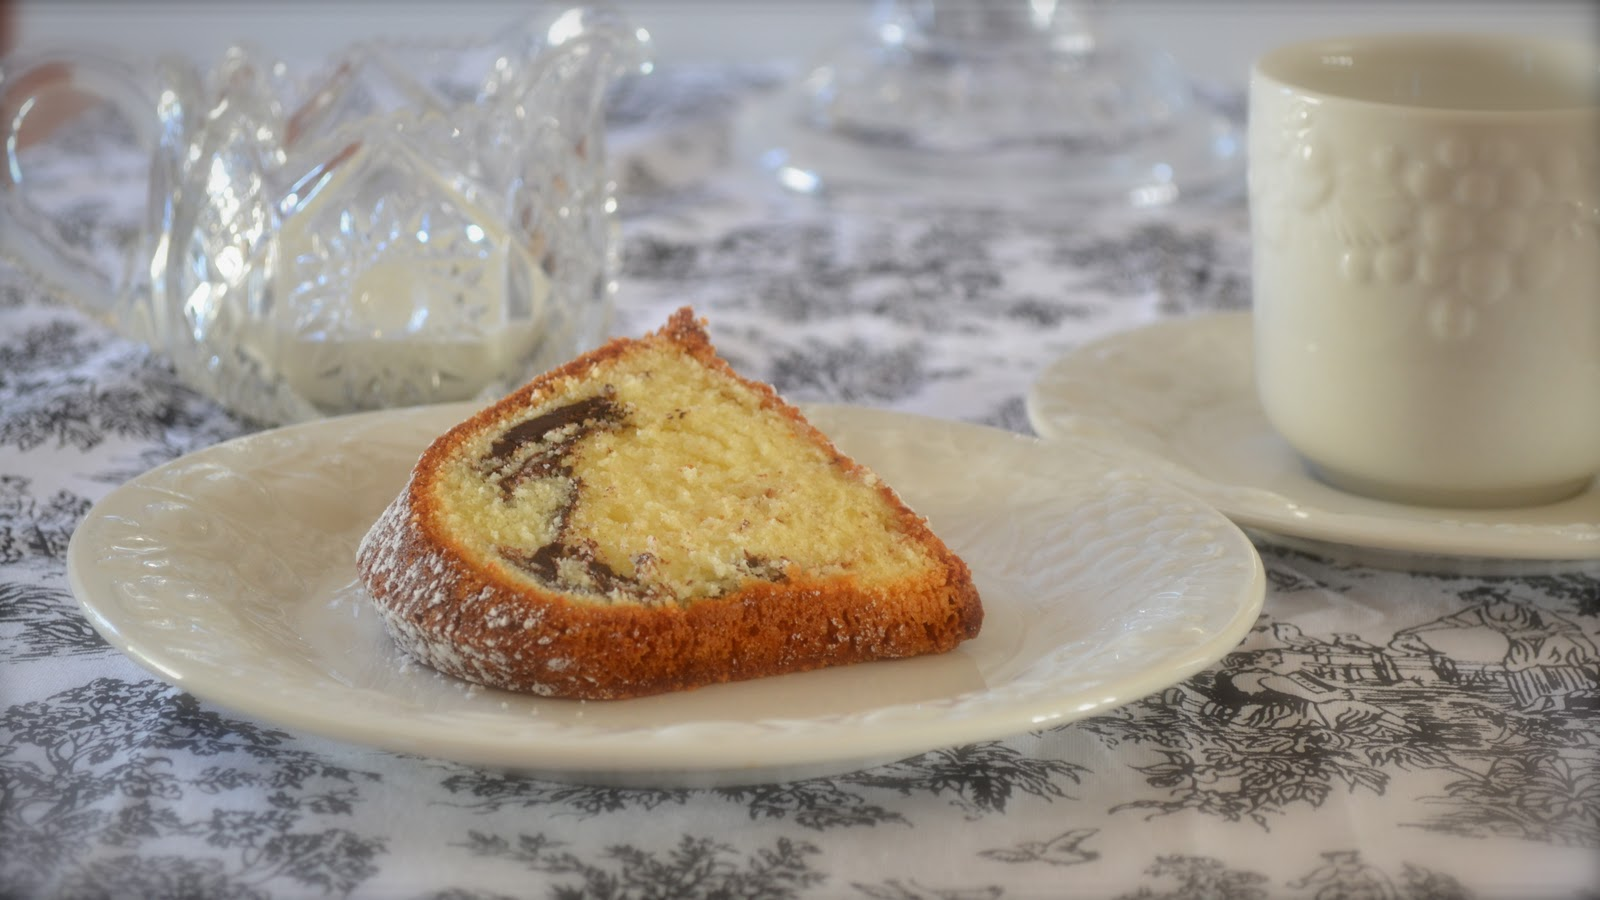 Philadelphia Cream Cheese Chocolate Pound Cake